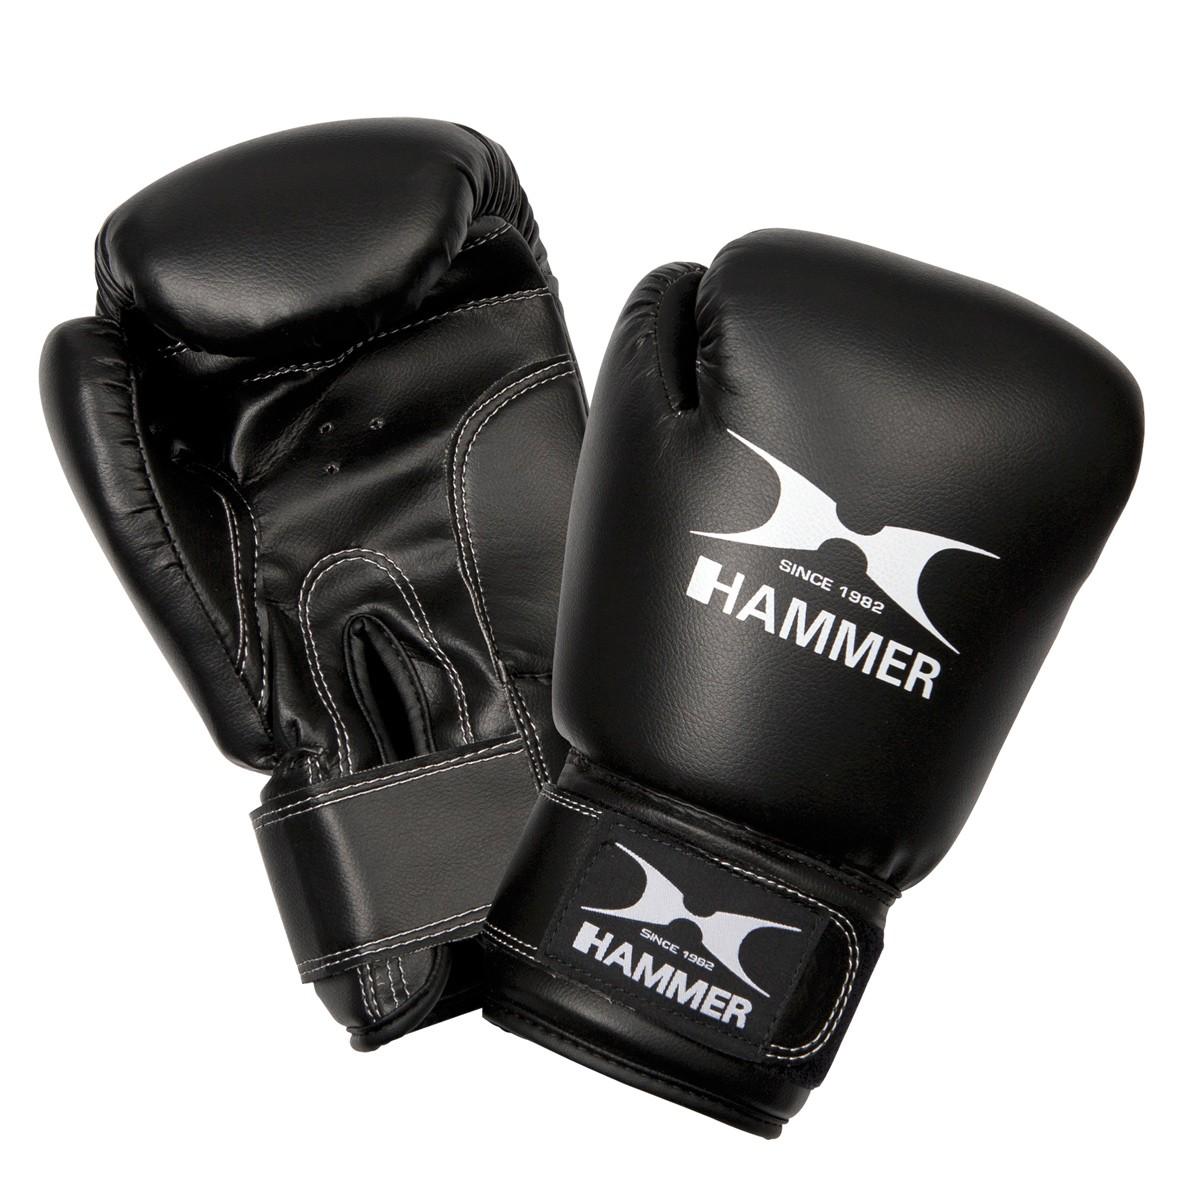 362dff89a Kit de Boxe Fit Junior de HAMMER BOXING